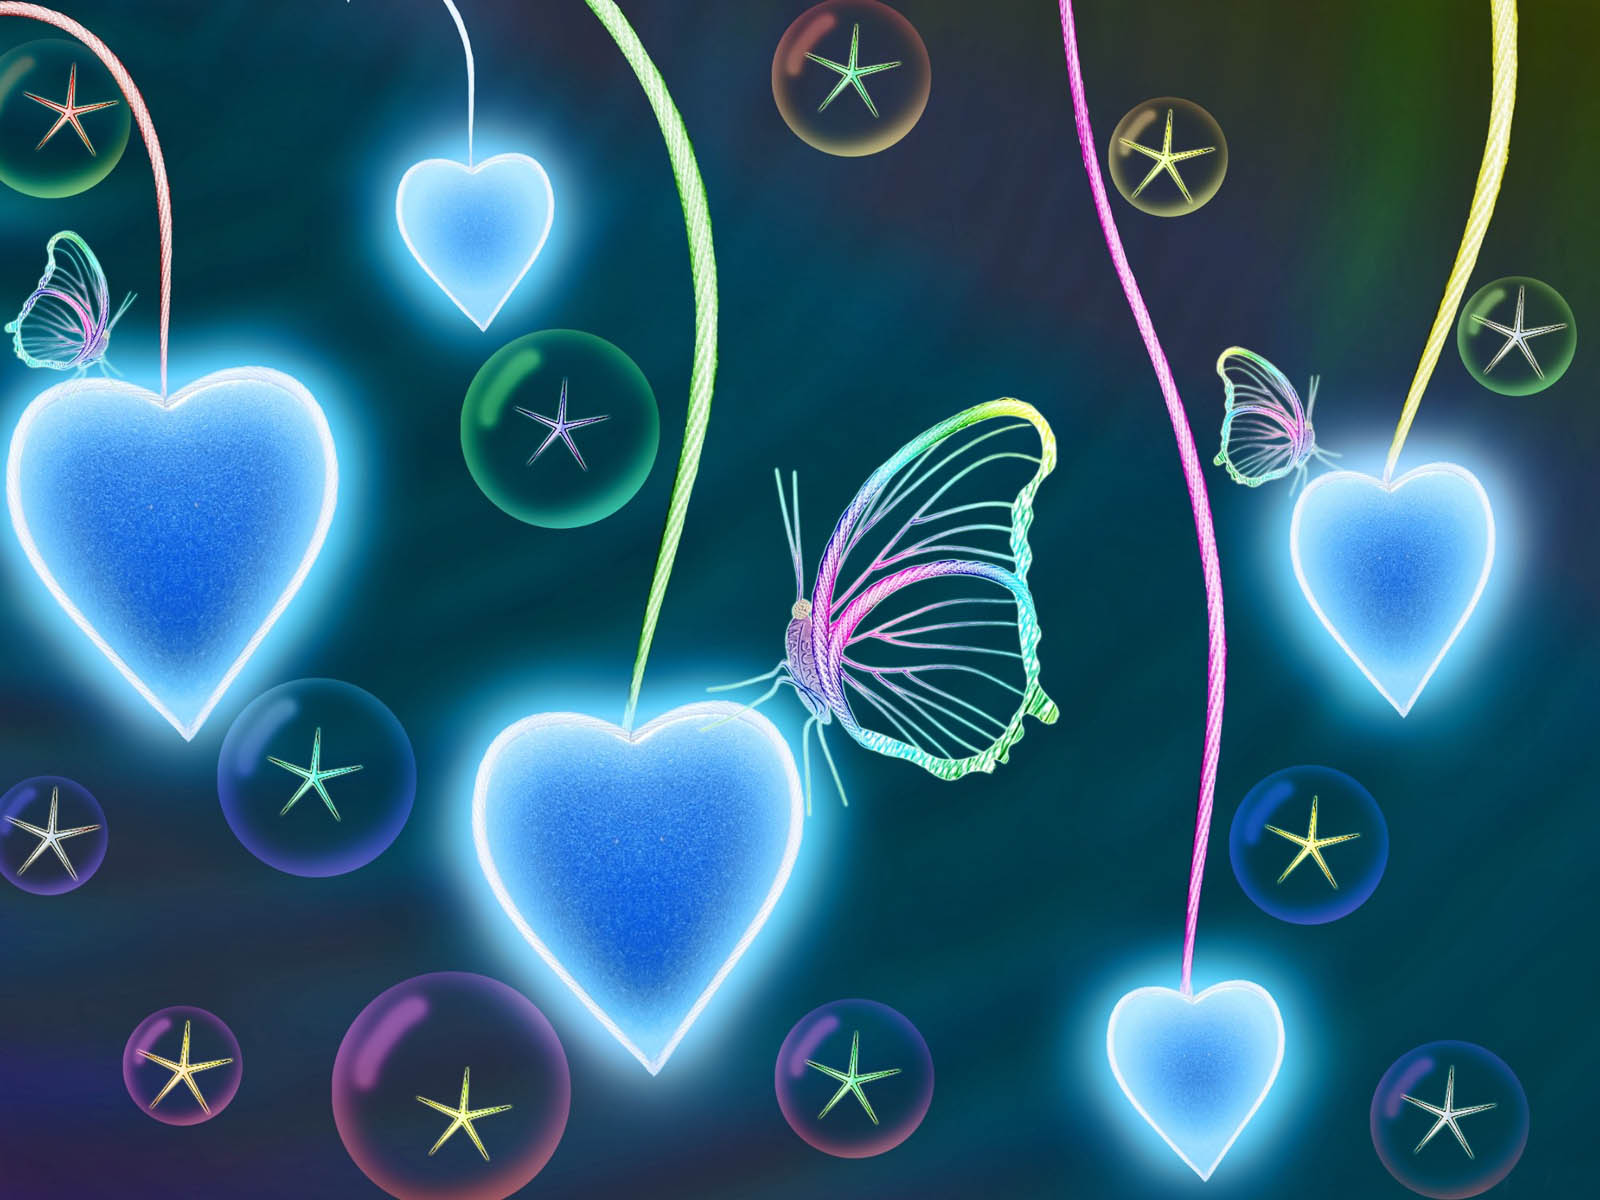 wallpapers: Butterfly Love Wallpapers3d Neon Butterflies